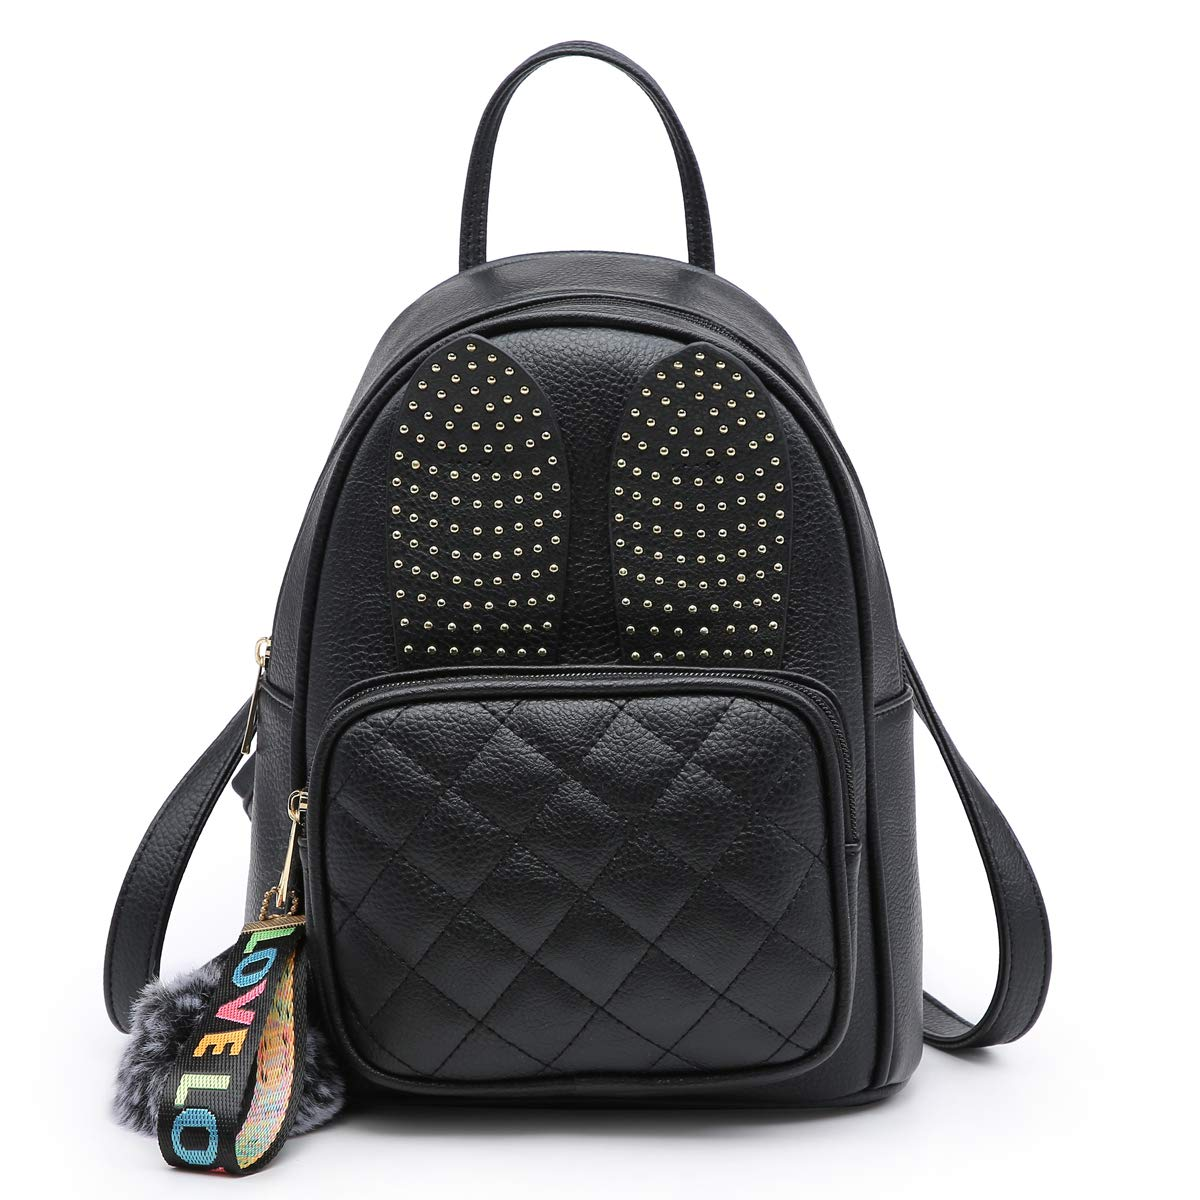 Girls Rabbit Ear Cute Mini Leather Backpack, XB Small Backpack Purse for Women Fashion Shoulder Bag (Black) by XB HANDBAG (Image #1)